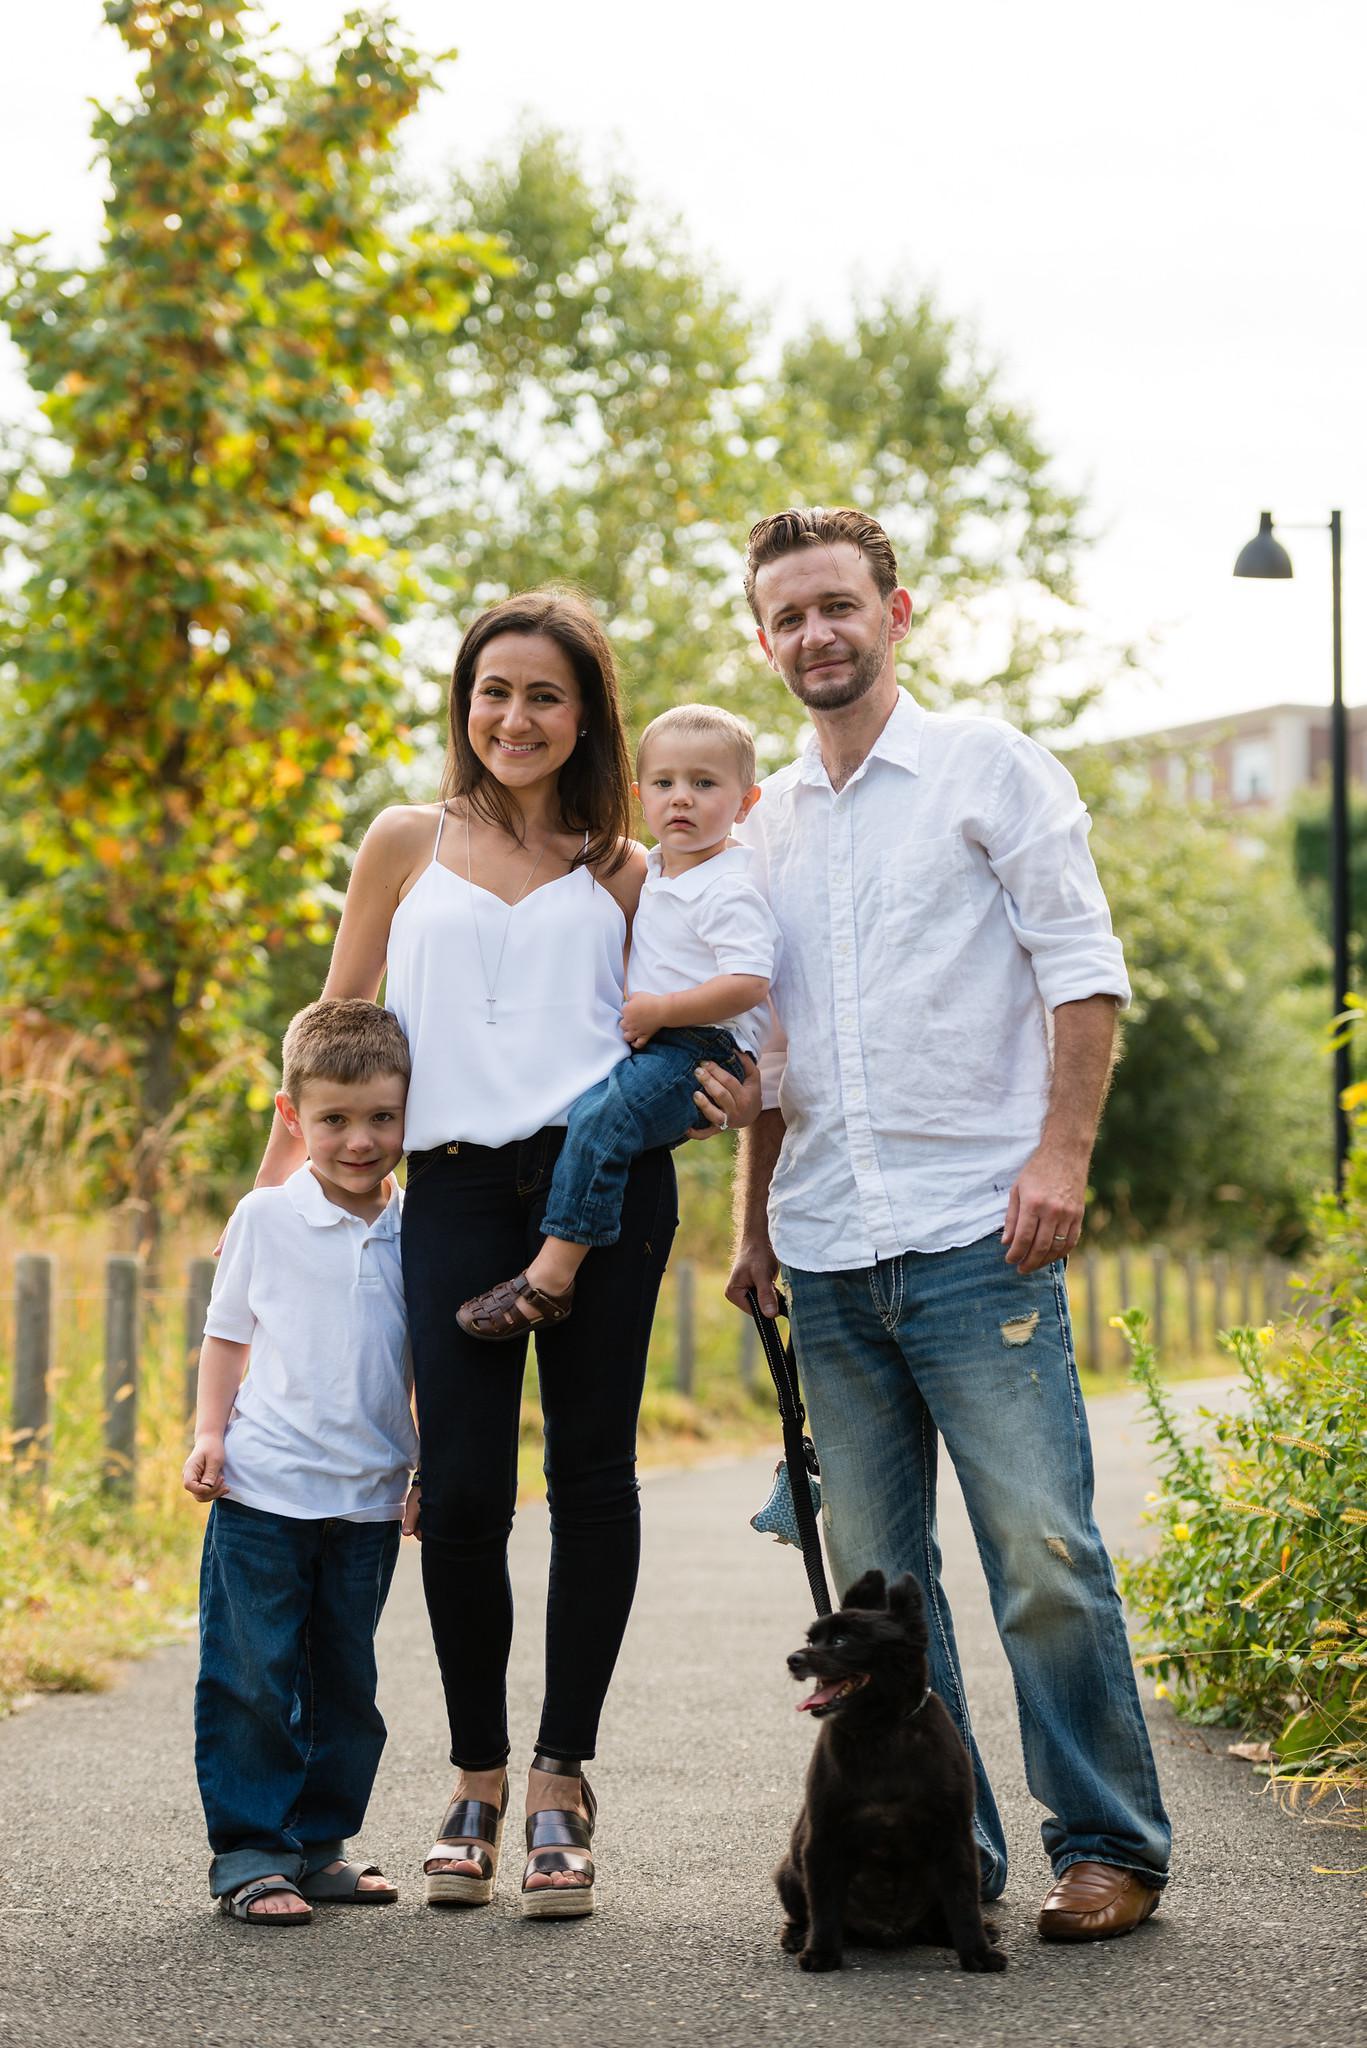 Inessa Makdulina-Nyzio, MS, RD, CDN and family